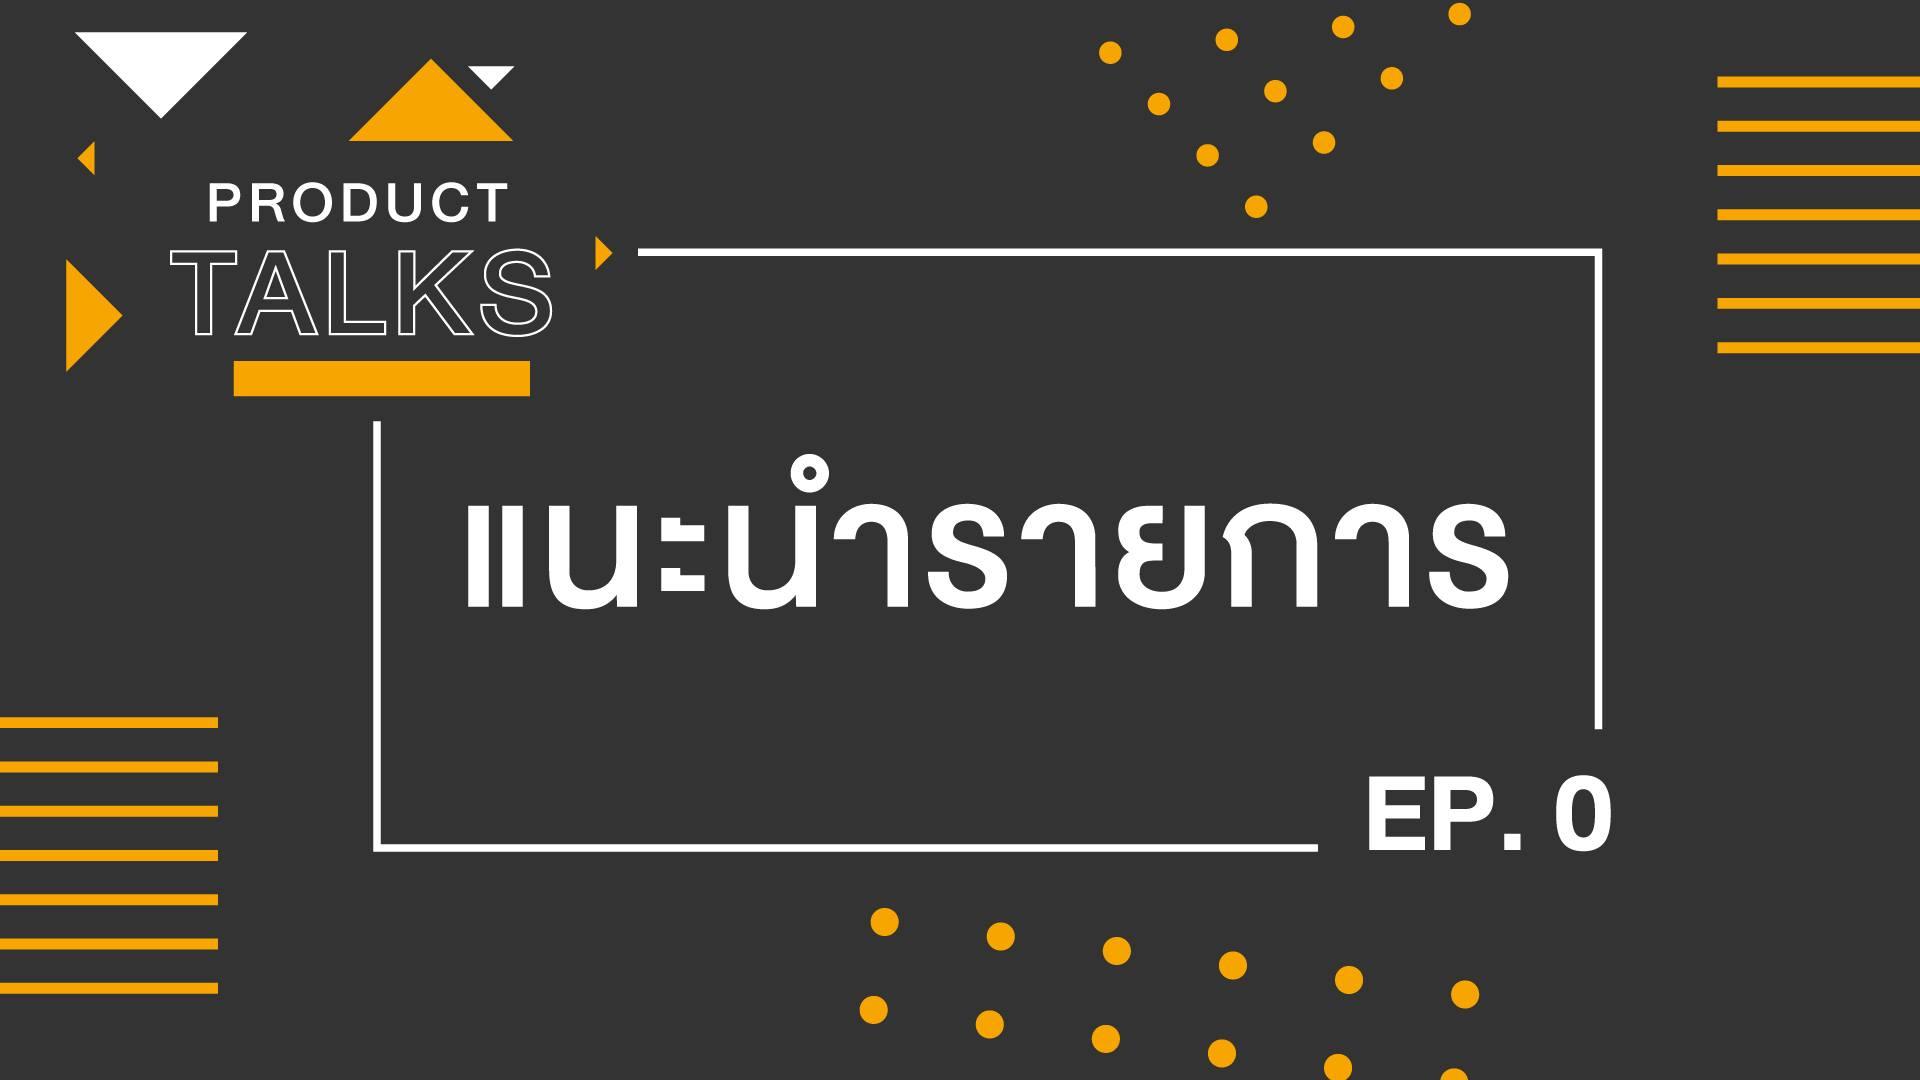 Product Talks: EP.0 แนะนำรายการใหม่ FINNOMENA Product Talks